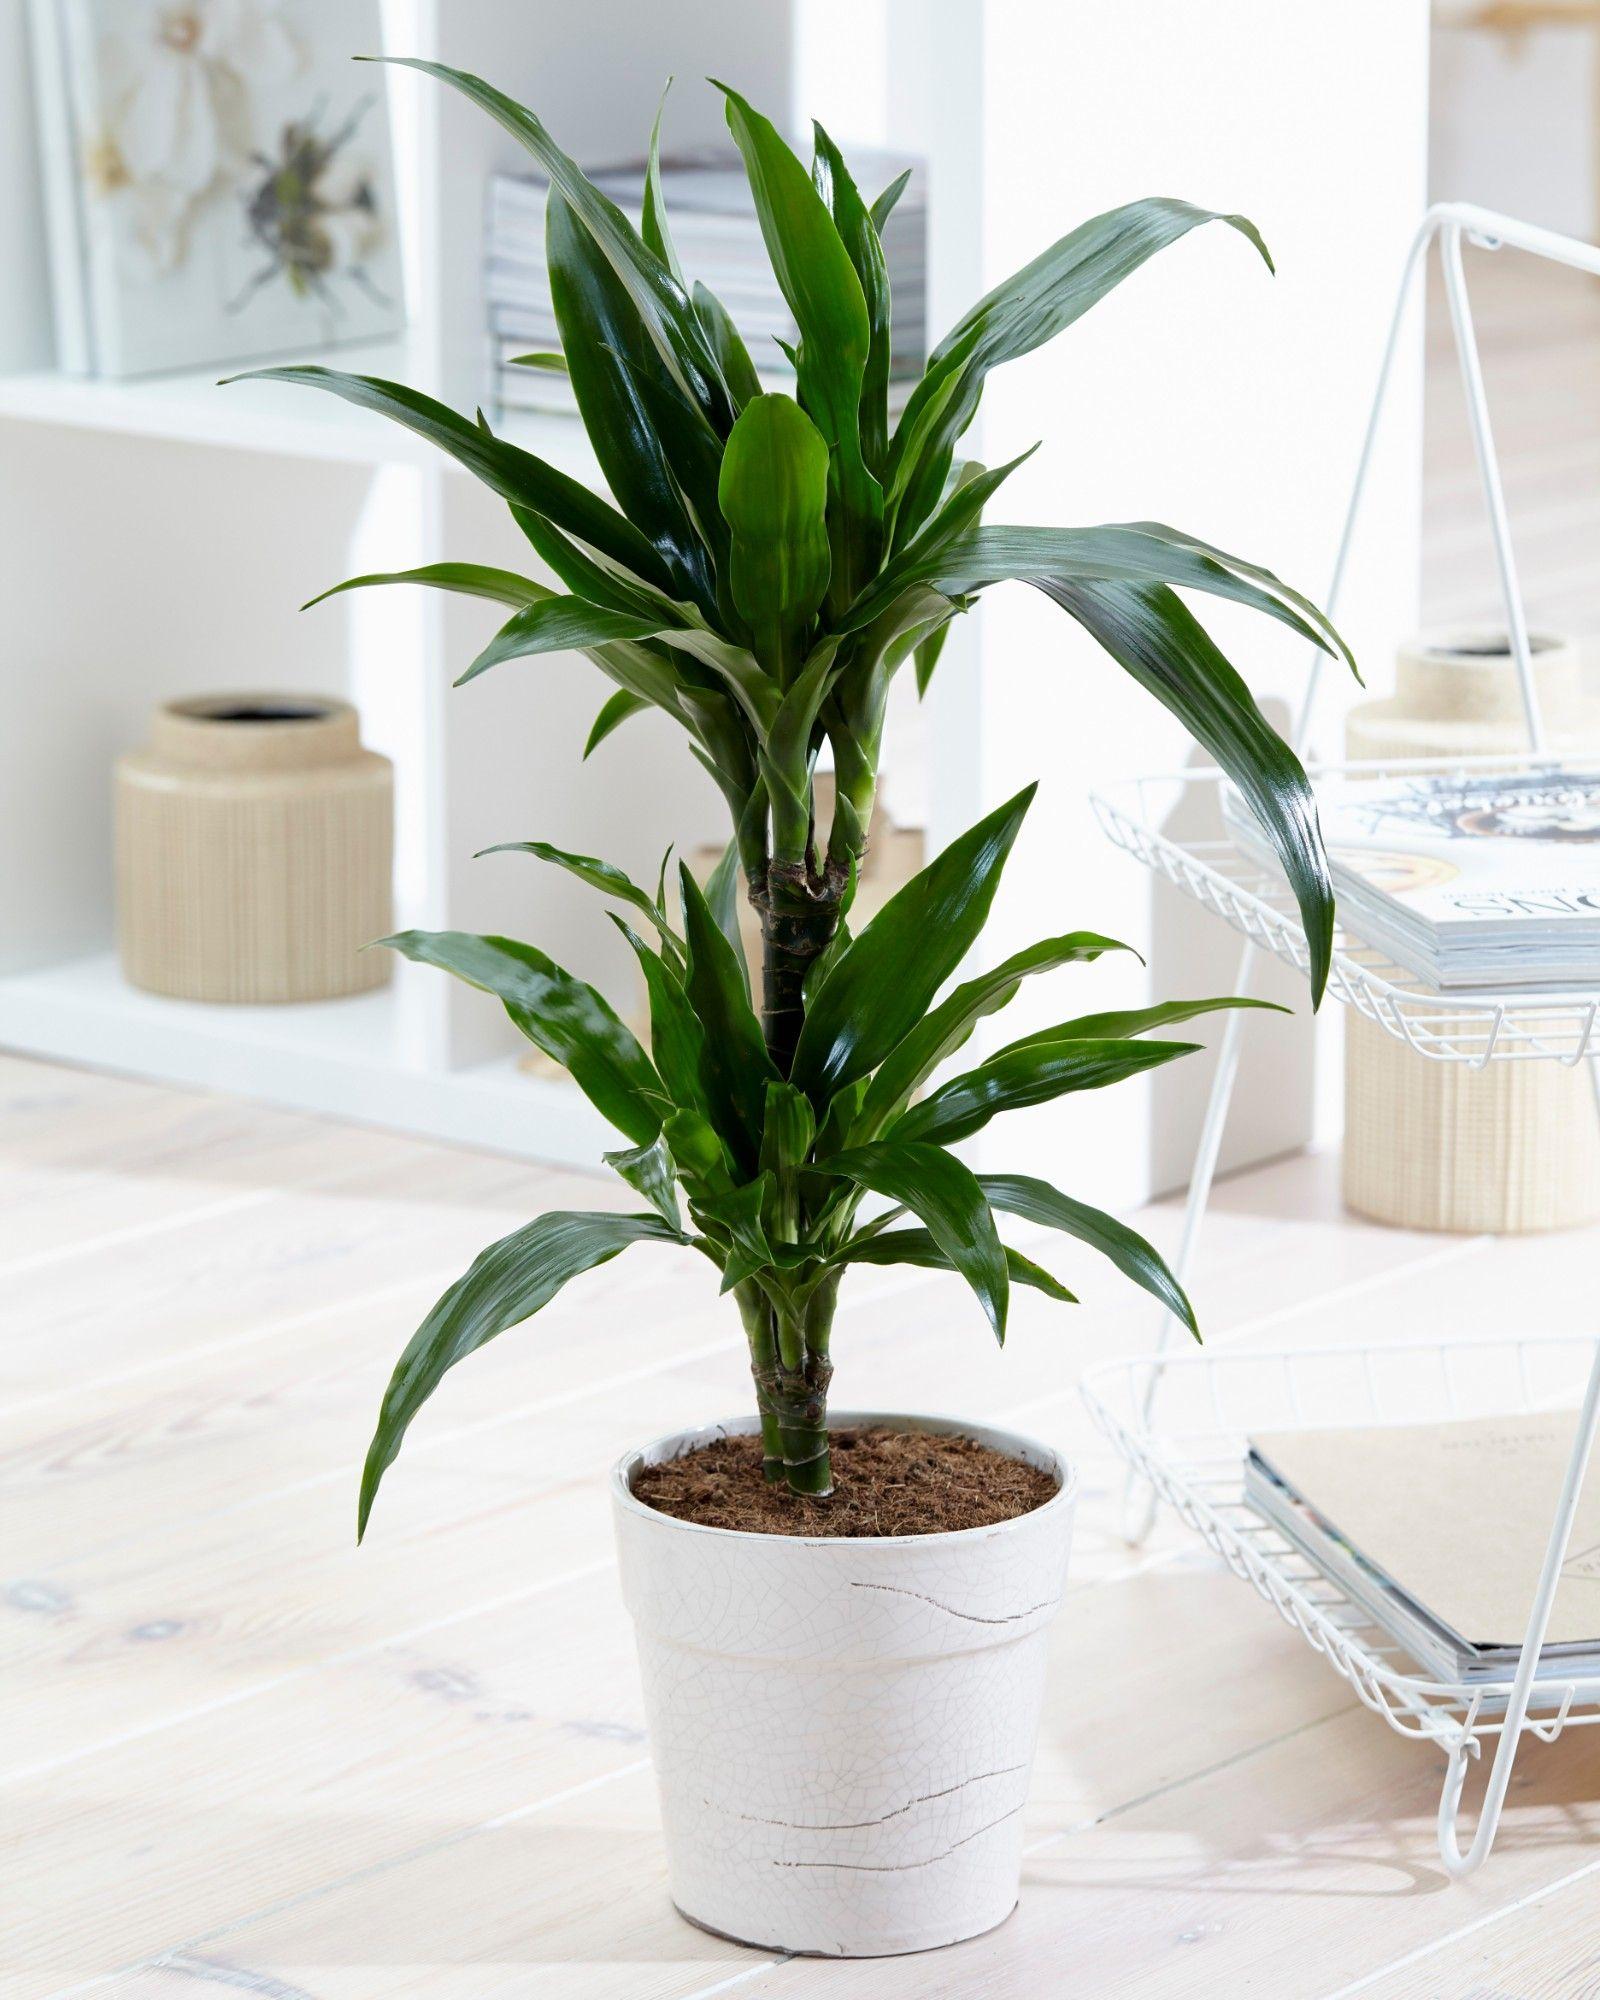 plante detoxifiante interieur)